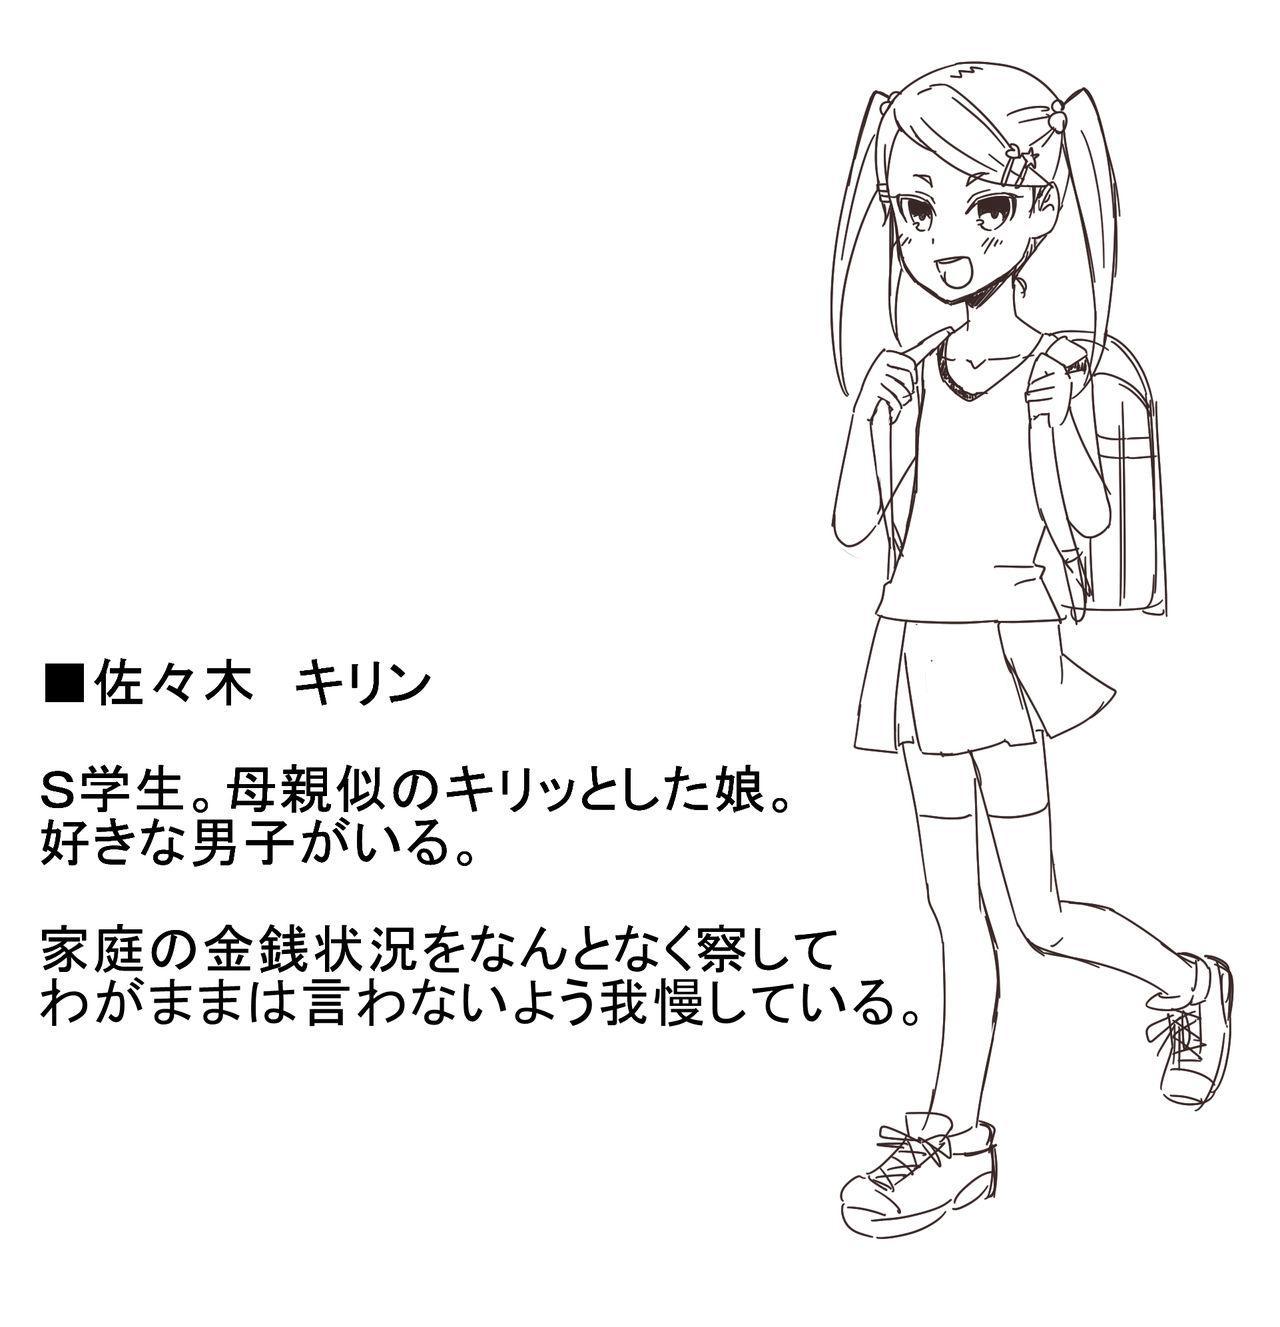 Hitozuma 127